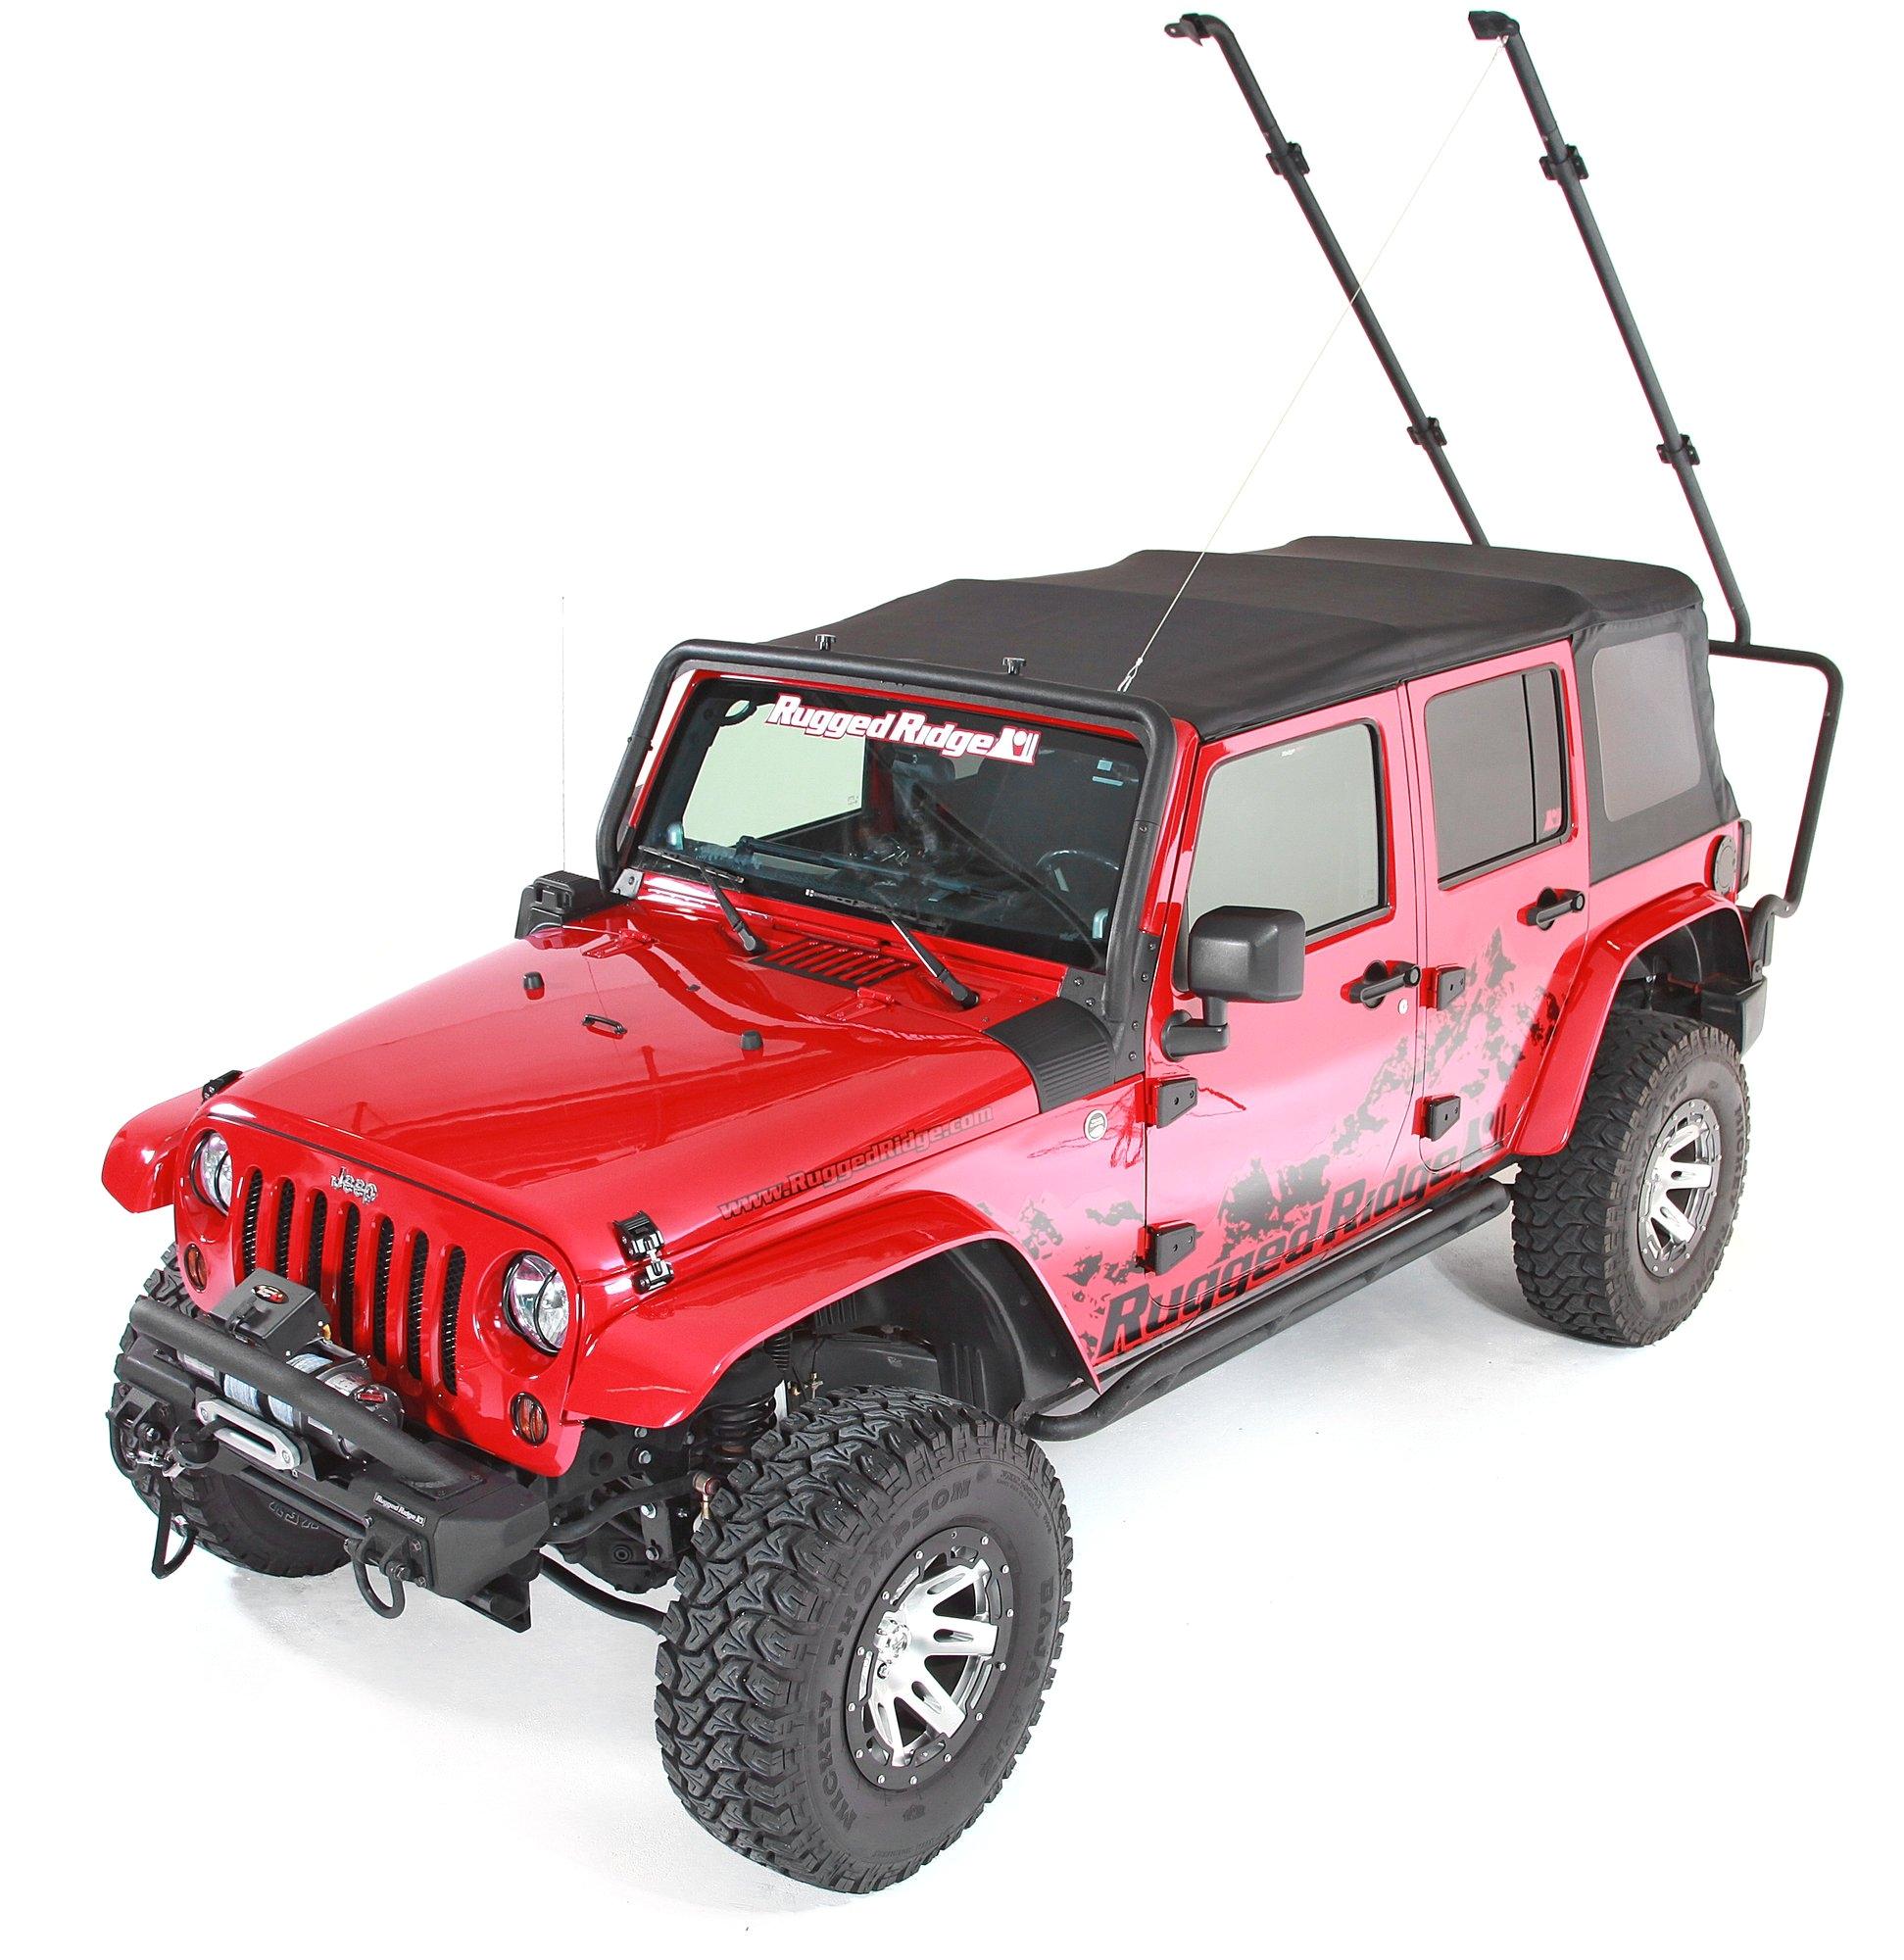 rugged ridge 11703 02 sherpa rack for 07 18 jeep wrangler unlimited jk 4 door quadratec